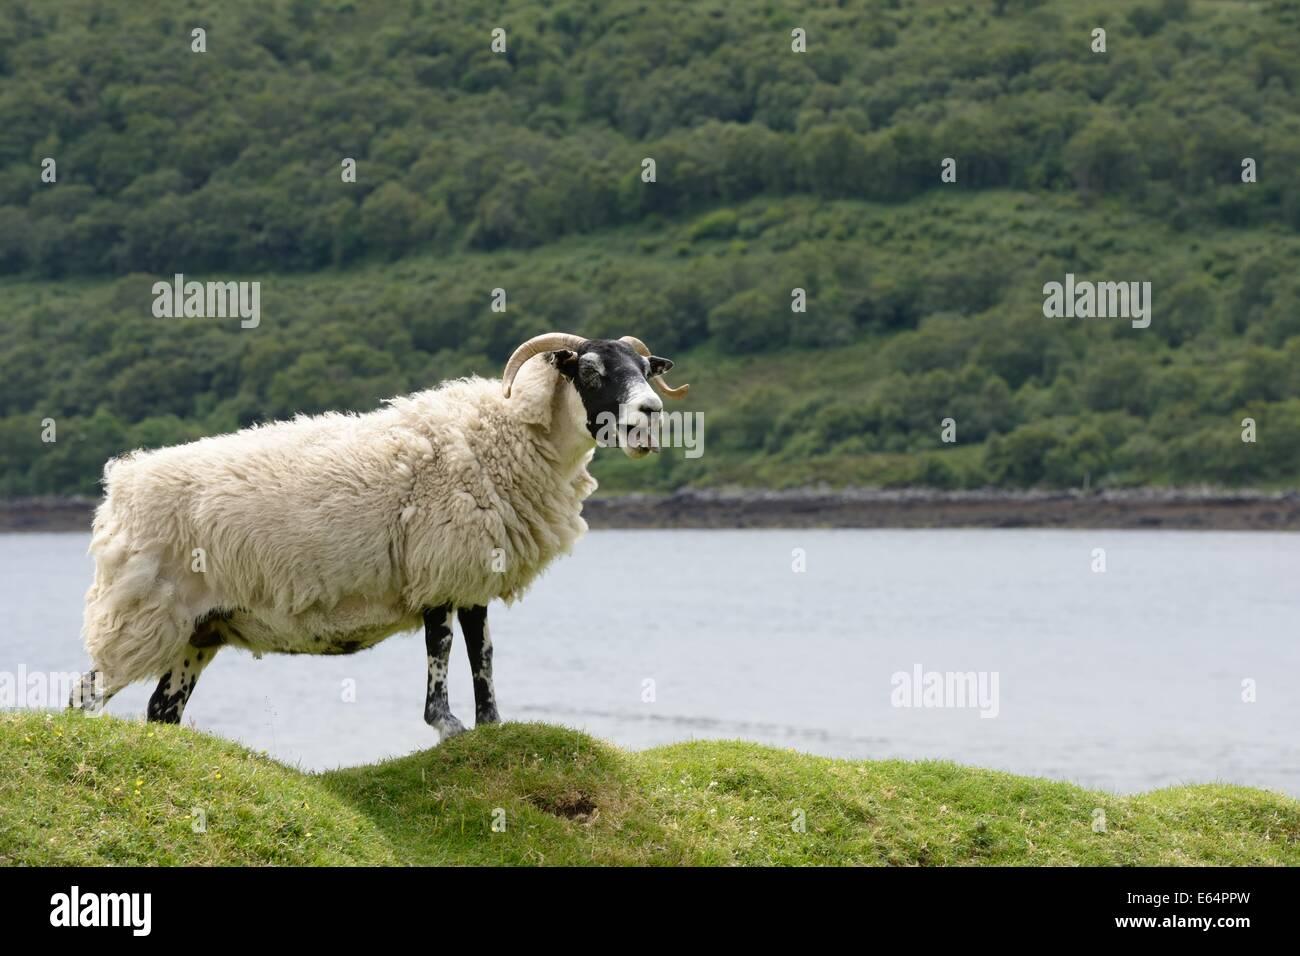 Blackface sheep roaming the Scottish landscape - Stock Image